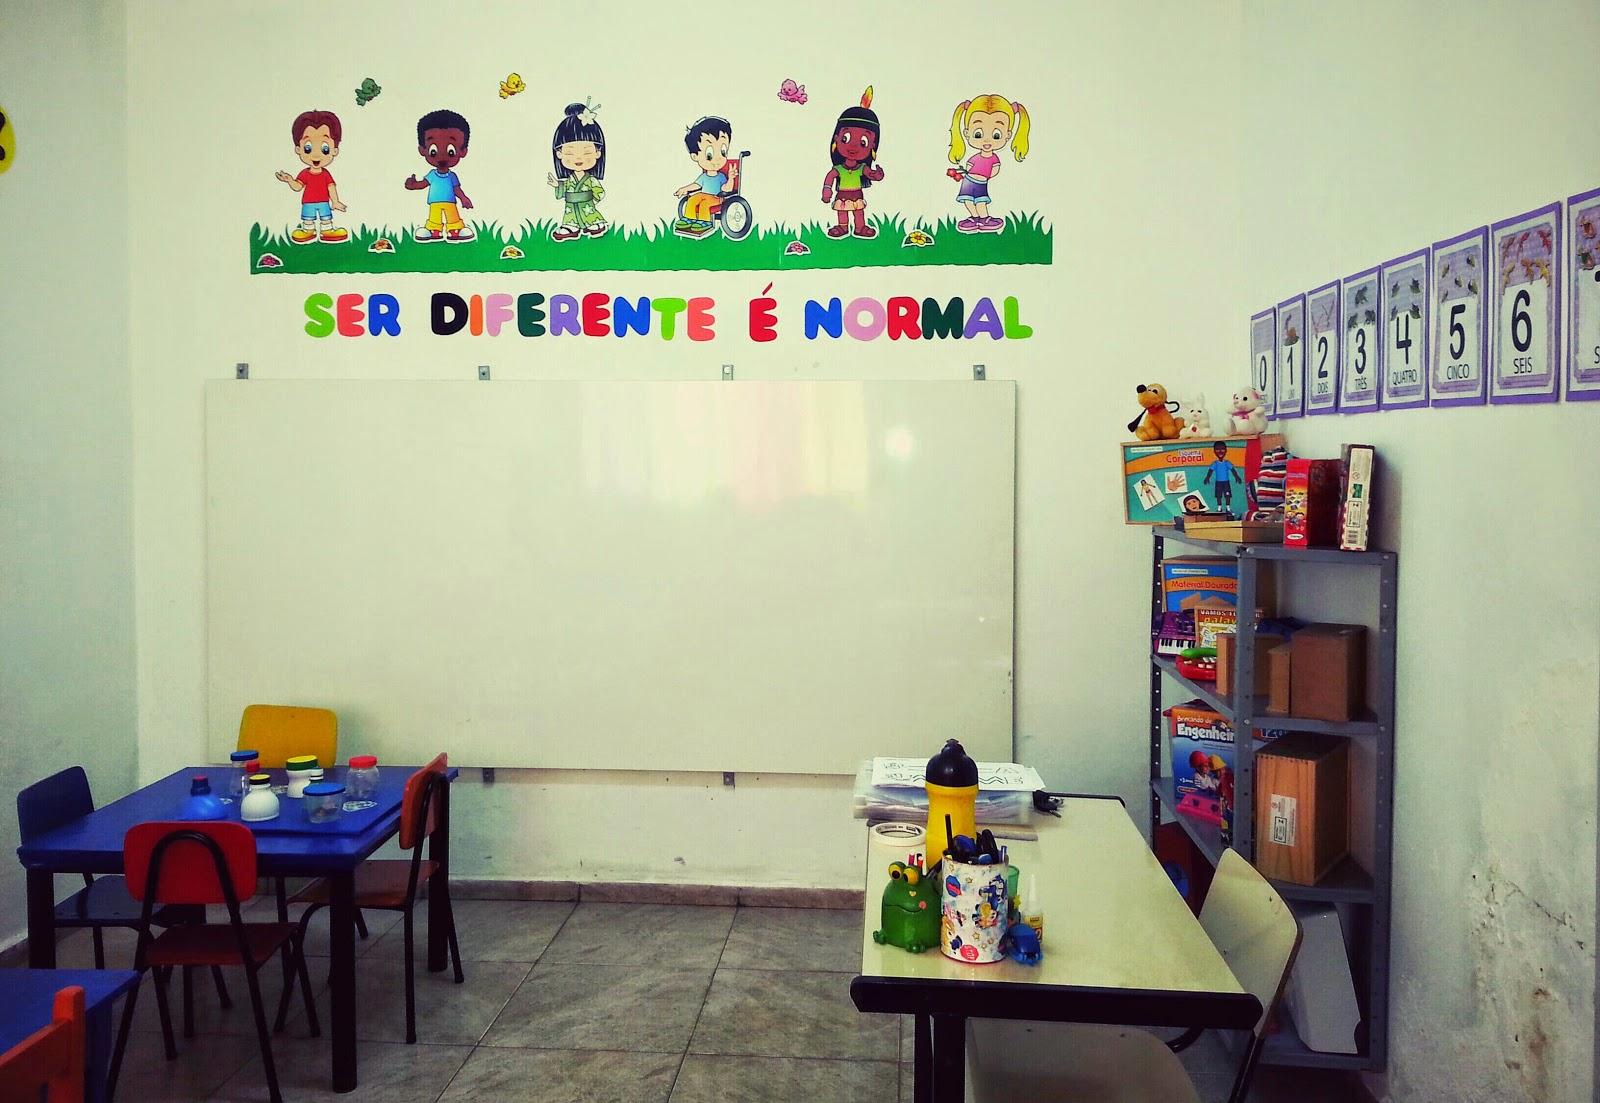 Sala De Recurso Multifuncional Prof M Rcia Ambrosim A Import Ncia  -> Decoracao Para Sala De Aee